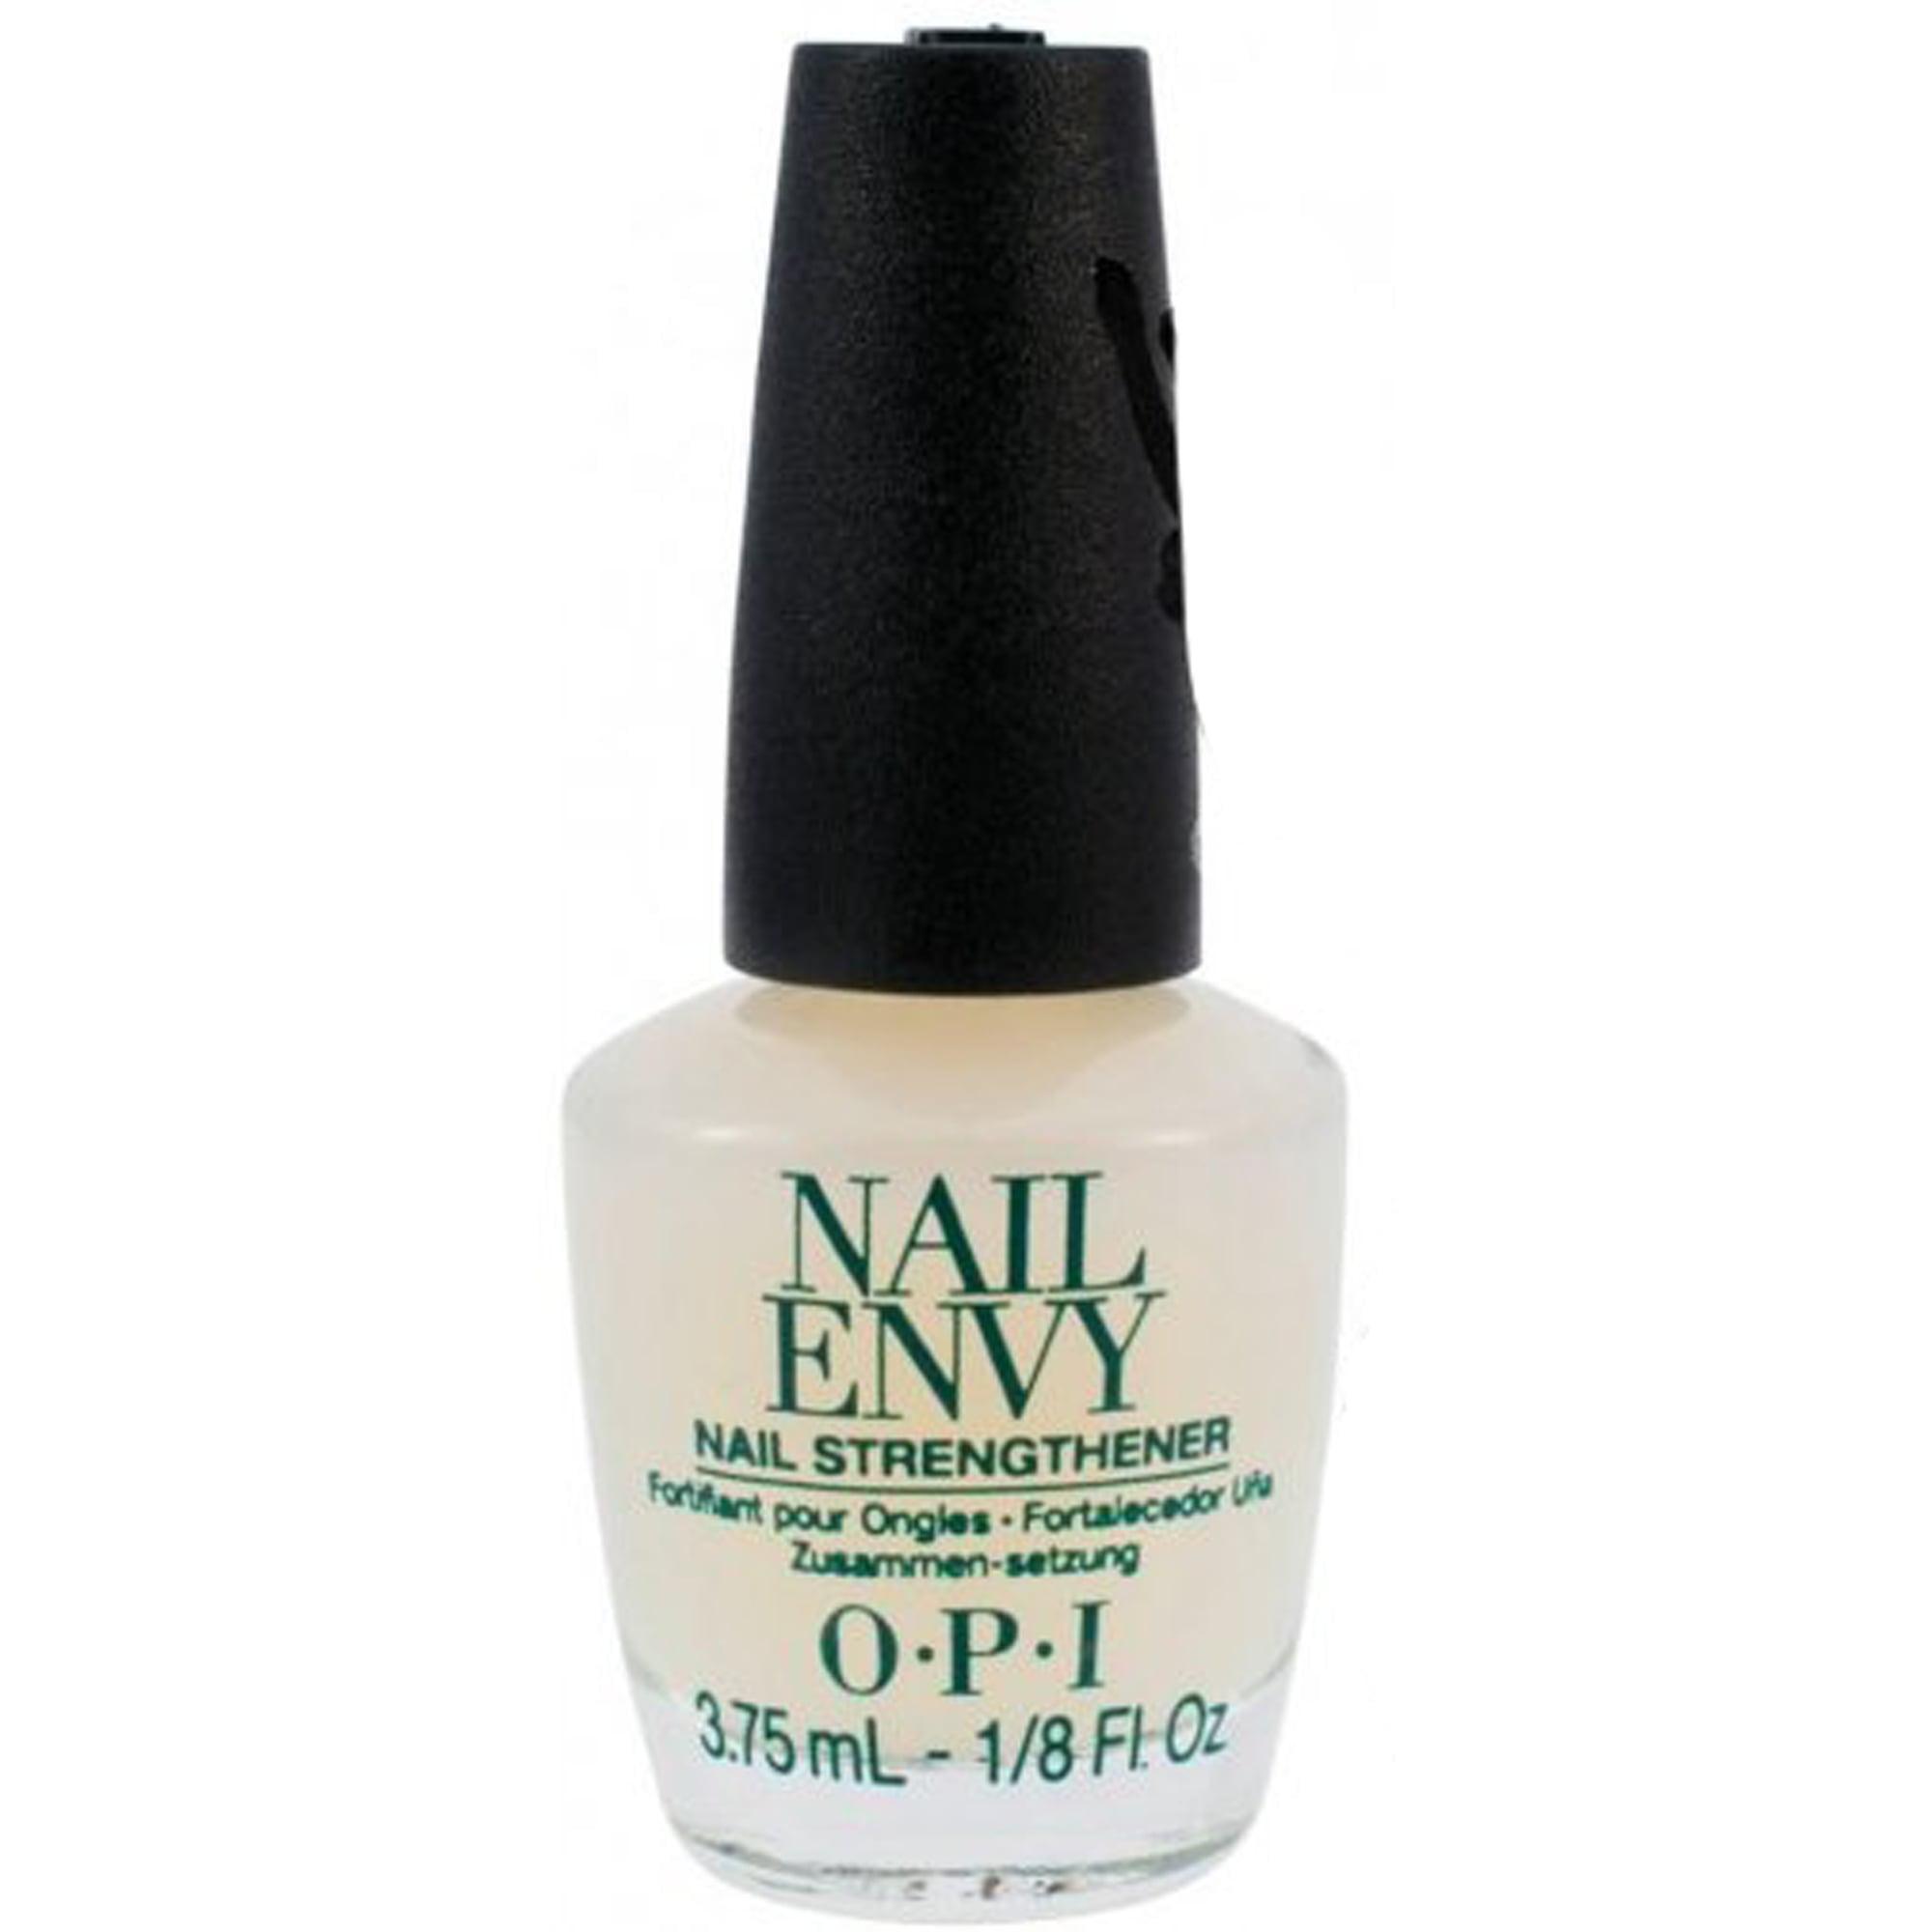 OPI Nail Strengthener Treatment Envy Original Mini Size 2 Bottles ...